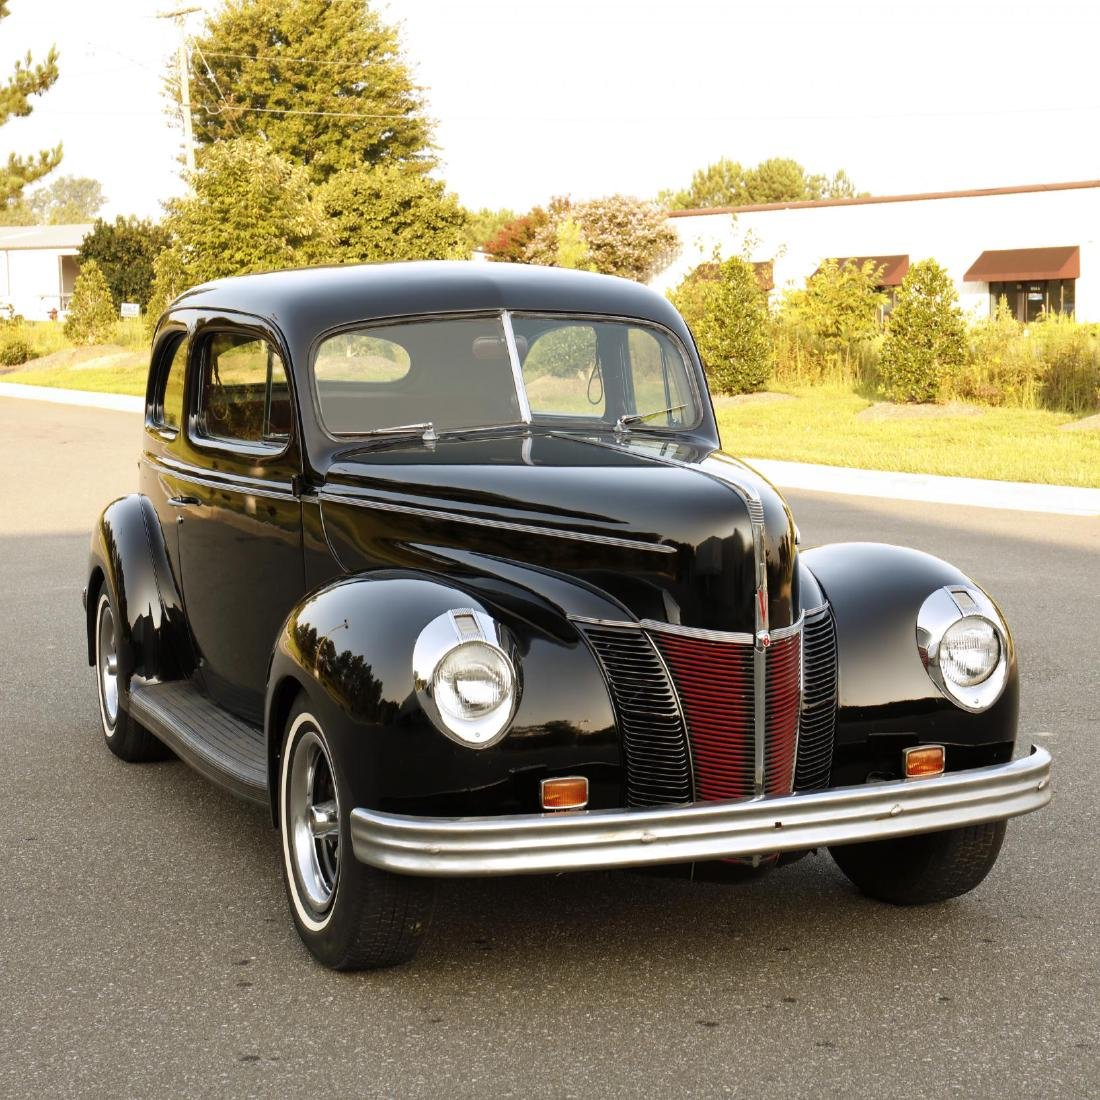 1940 Ford Deluxe Tudor Sedan - 4